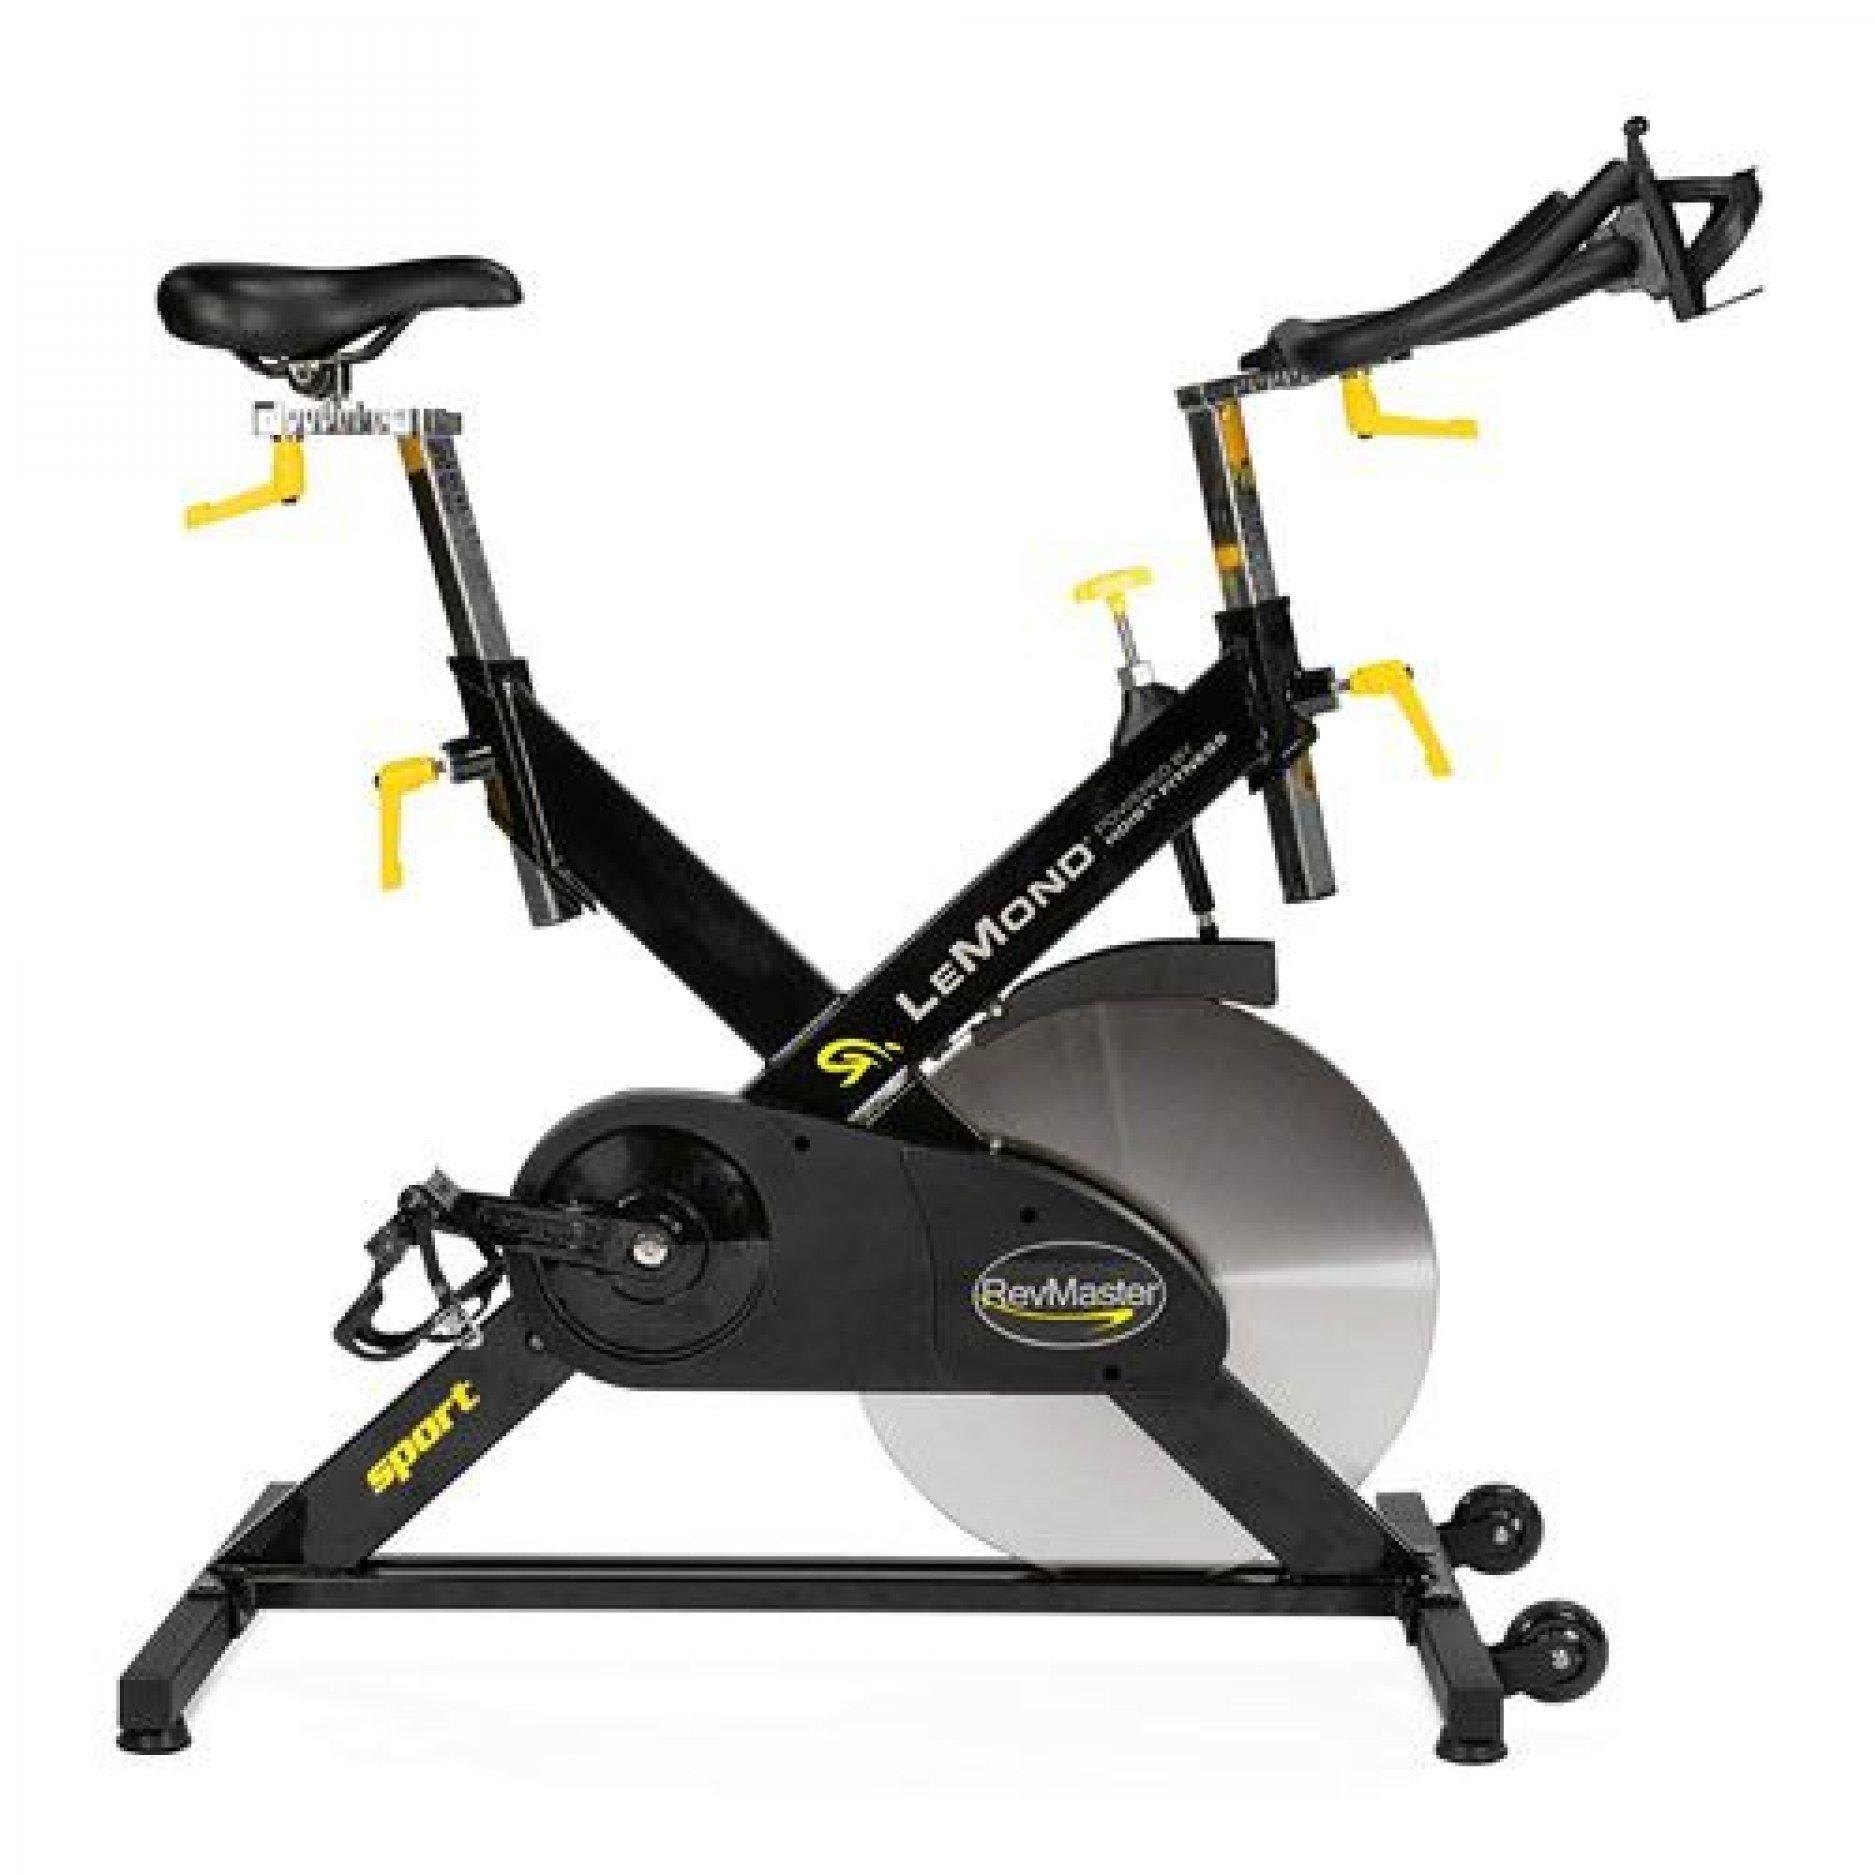 Велотренажер HOIST LeMond Revmaster Sport